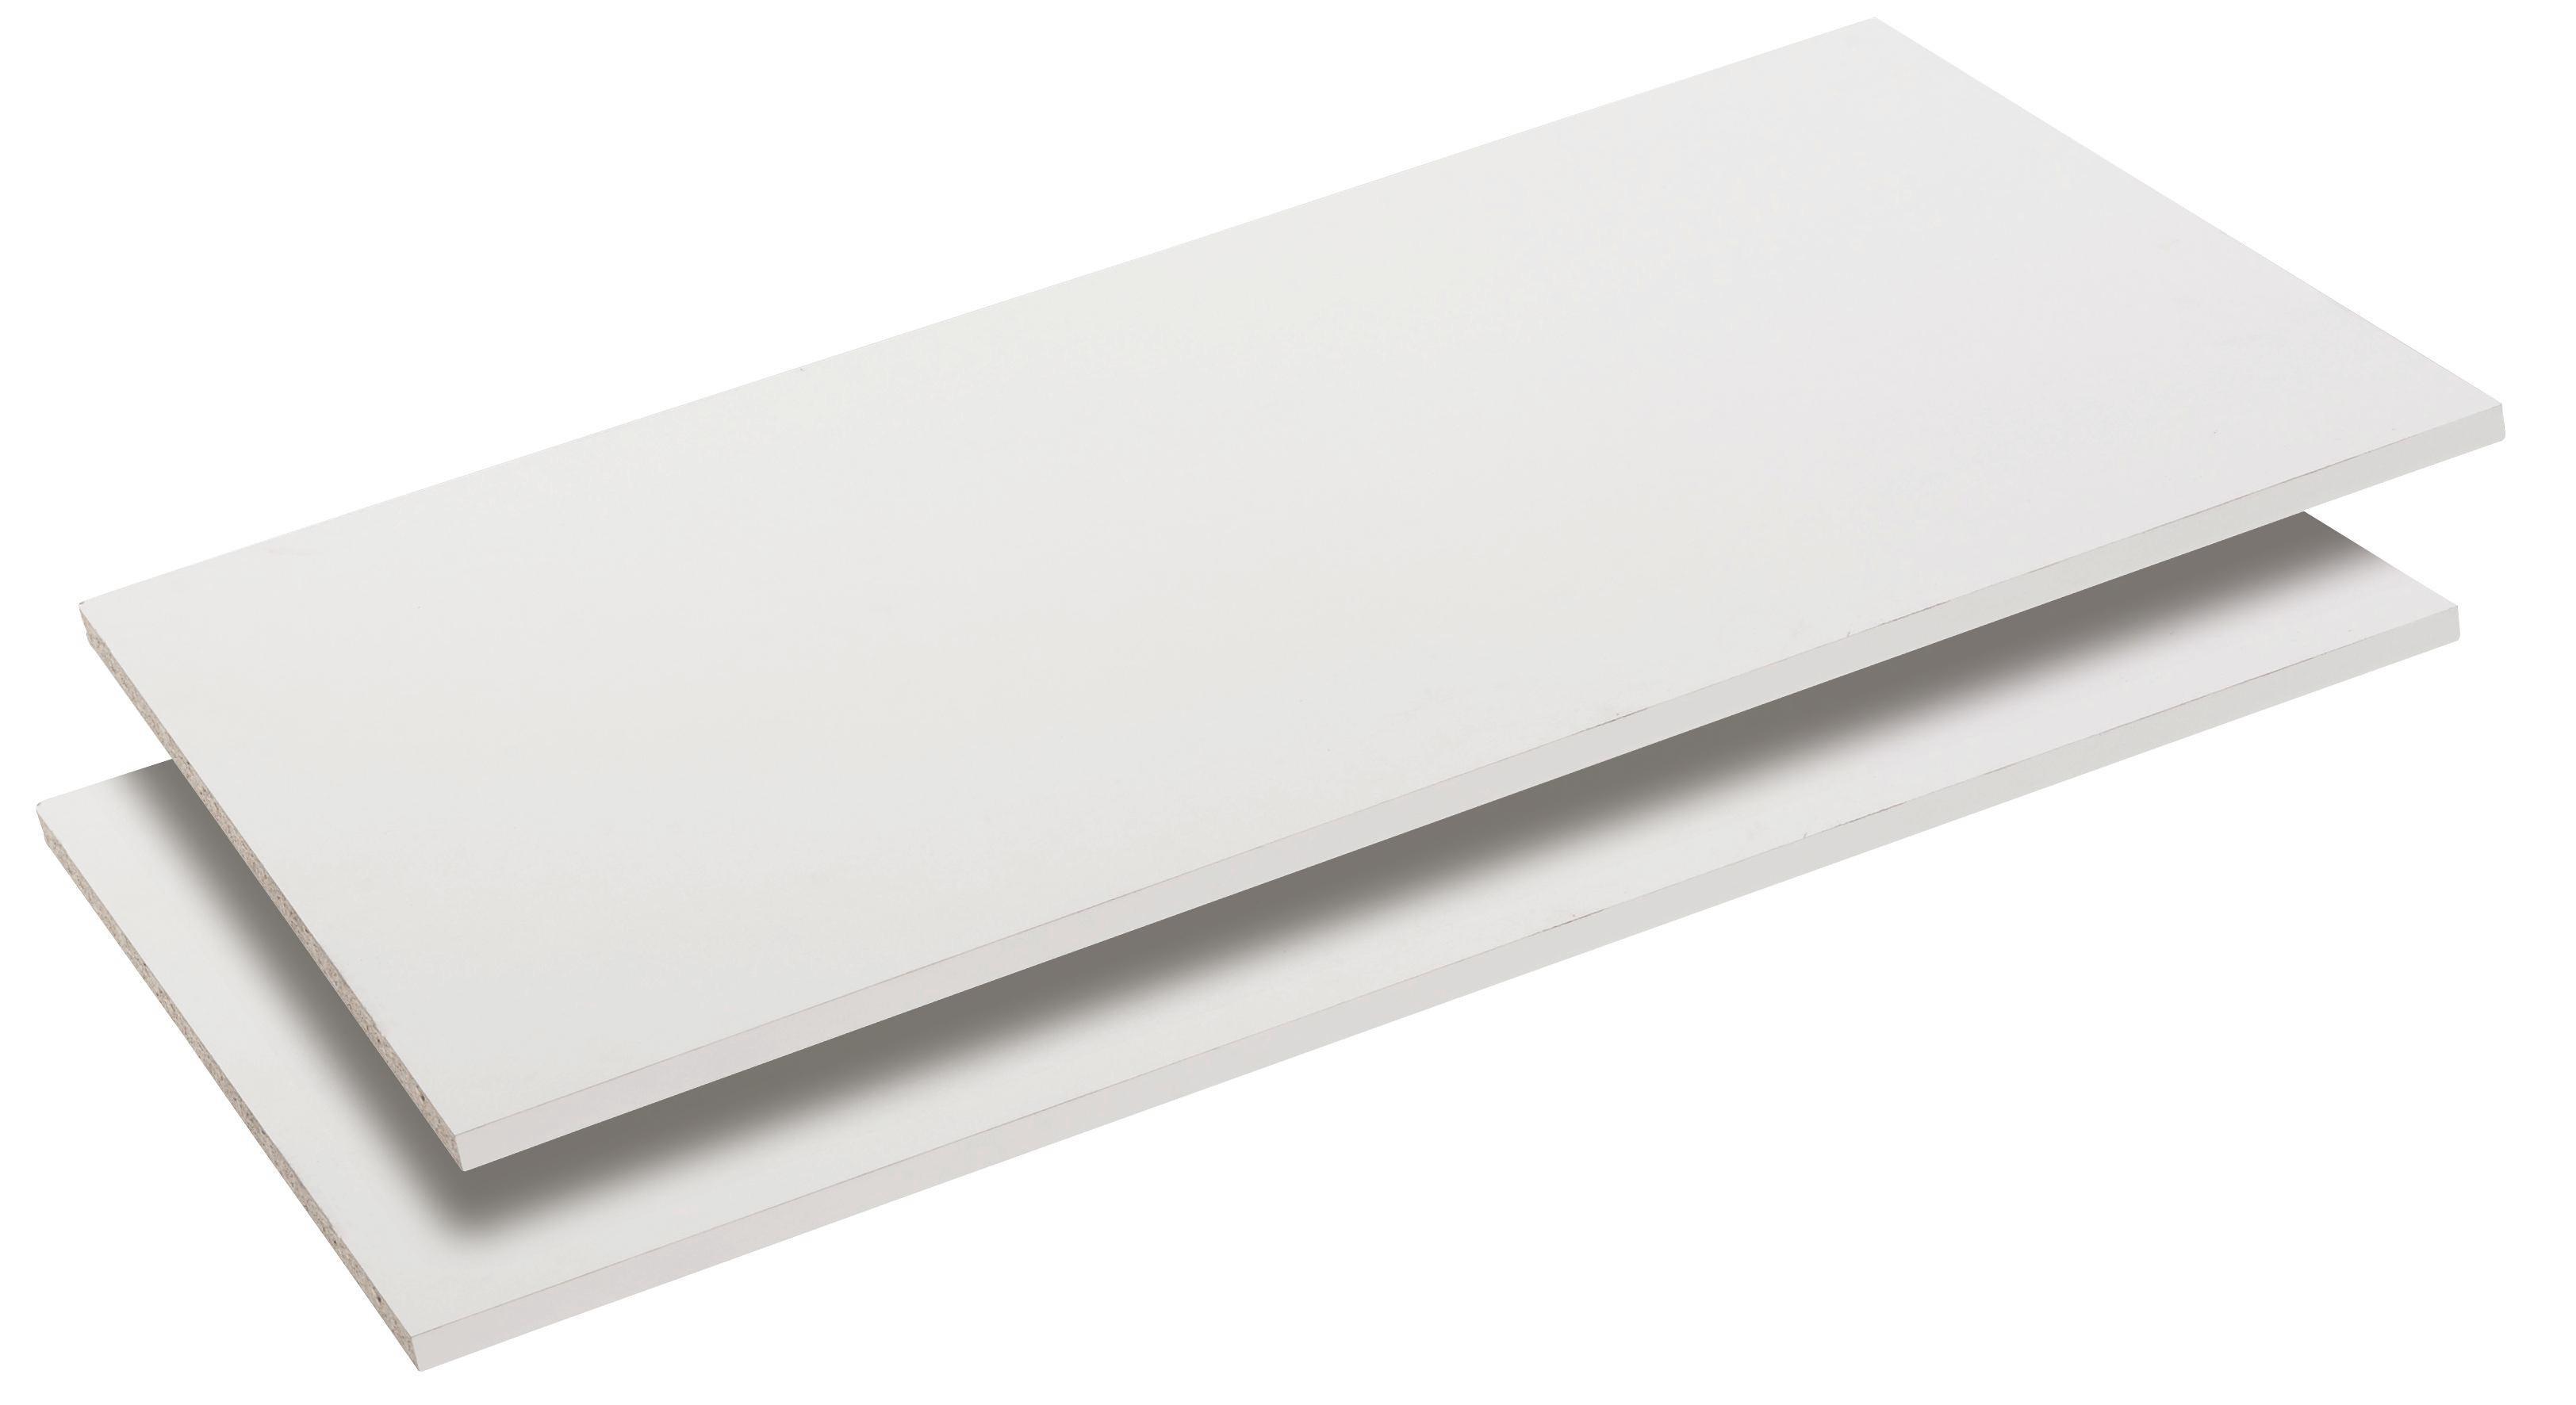 Sada Vkládacích Polic Viktor 4, Marvic, 2-jitý Set - bílá, Moderní, dřevo (105/2/48cm)